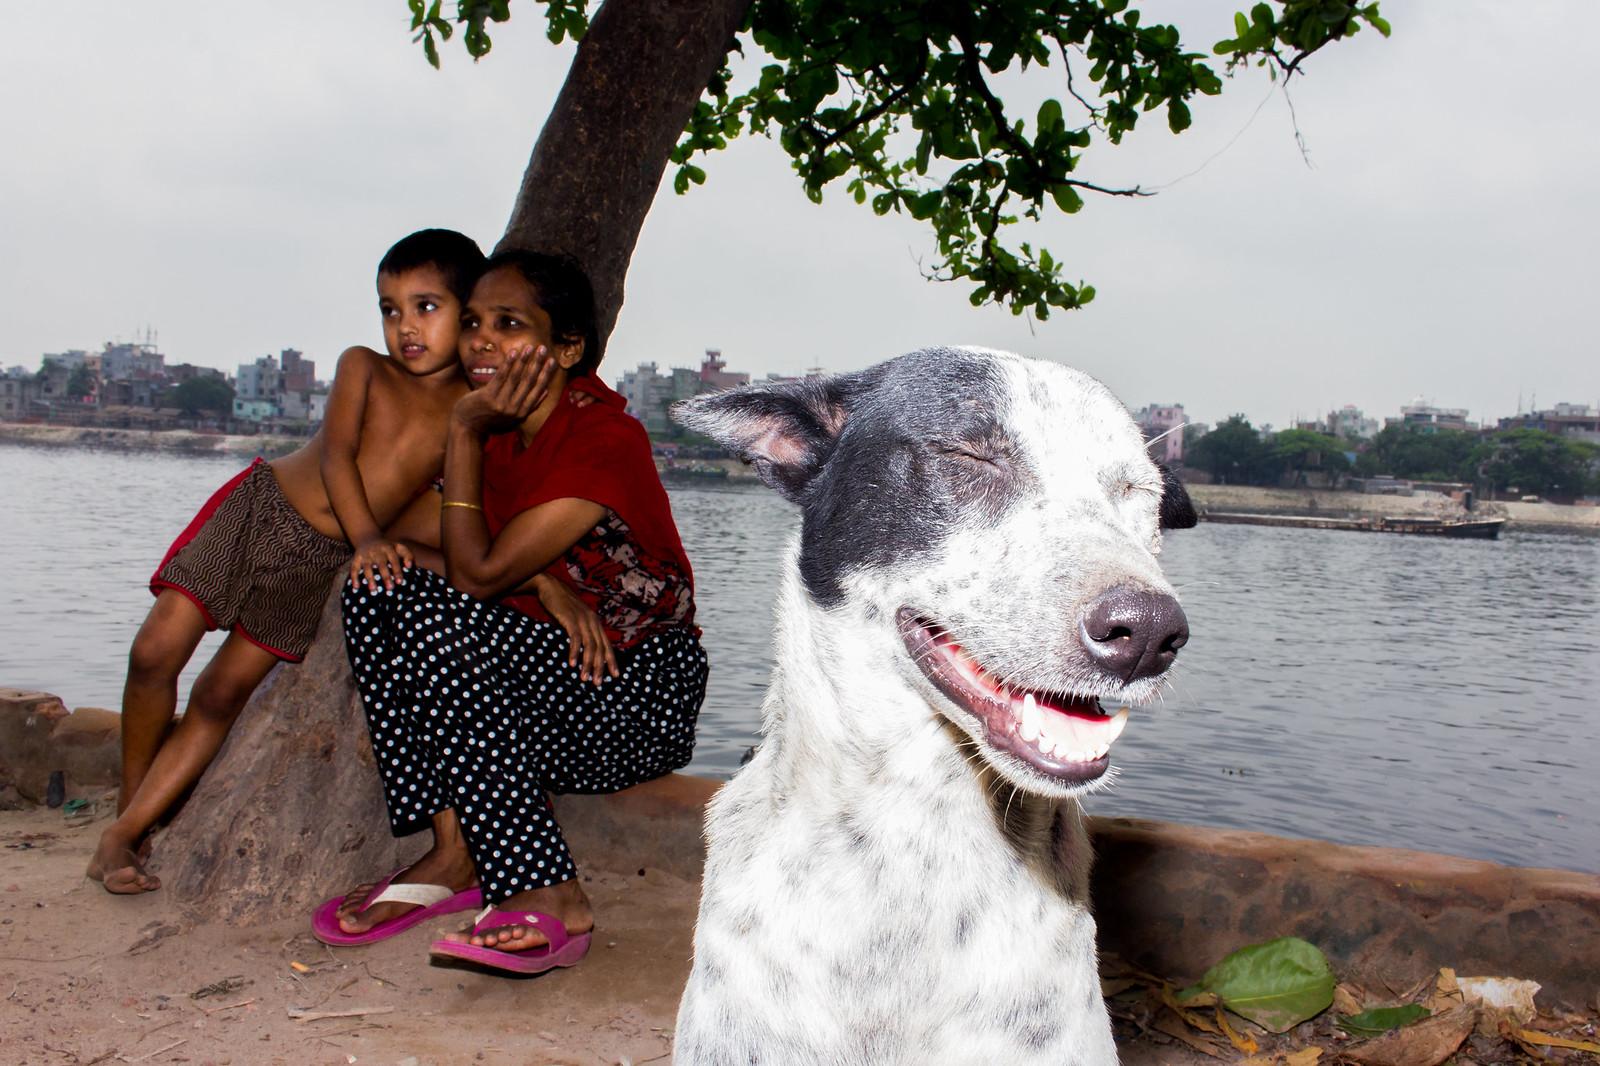 Dhaka, Bangladesh | by Md Enamul Kabir